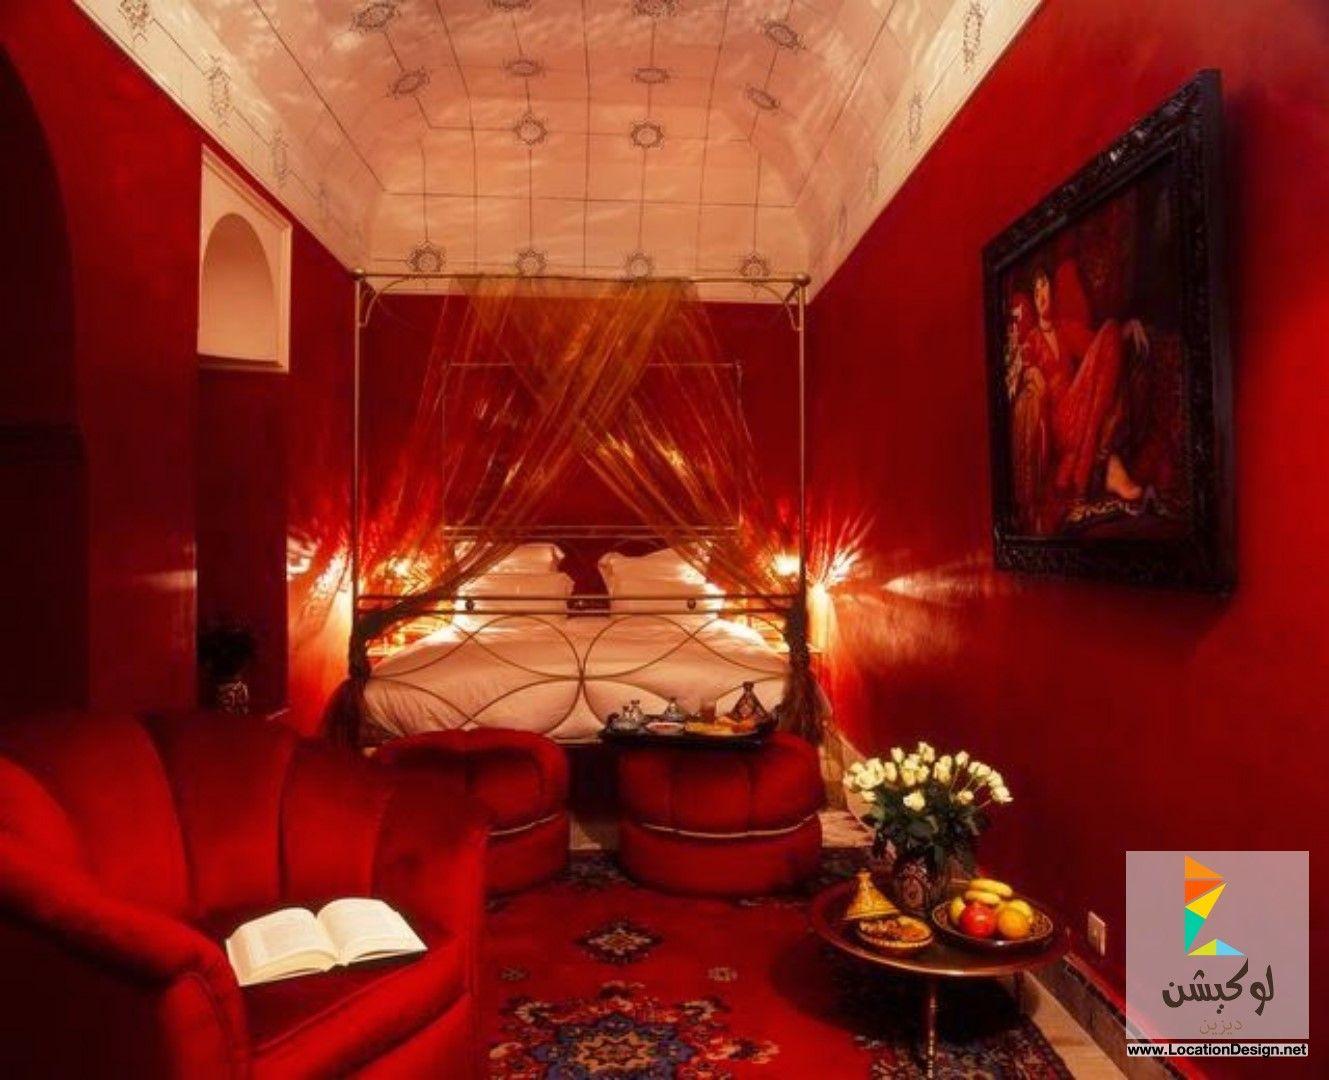 دهانات غرف نوم احمر وابيض | دهانات | Pinterest